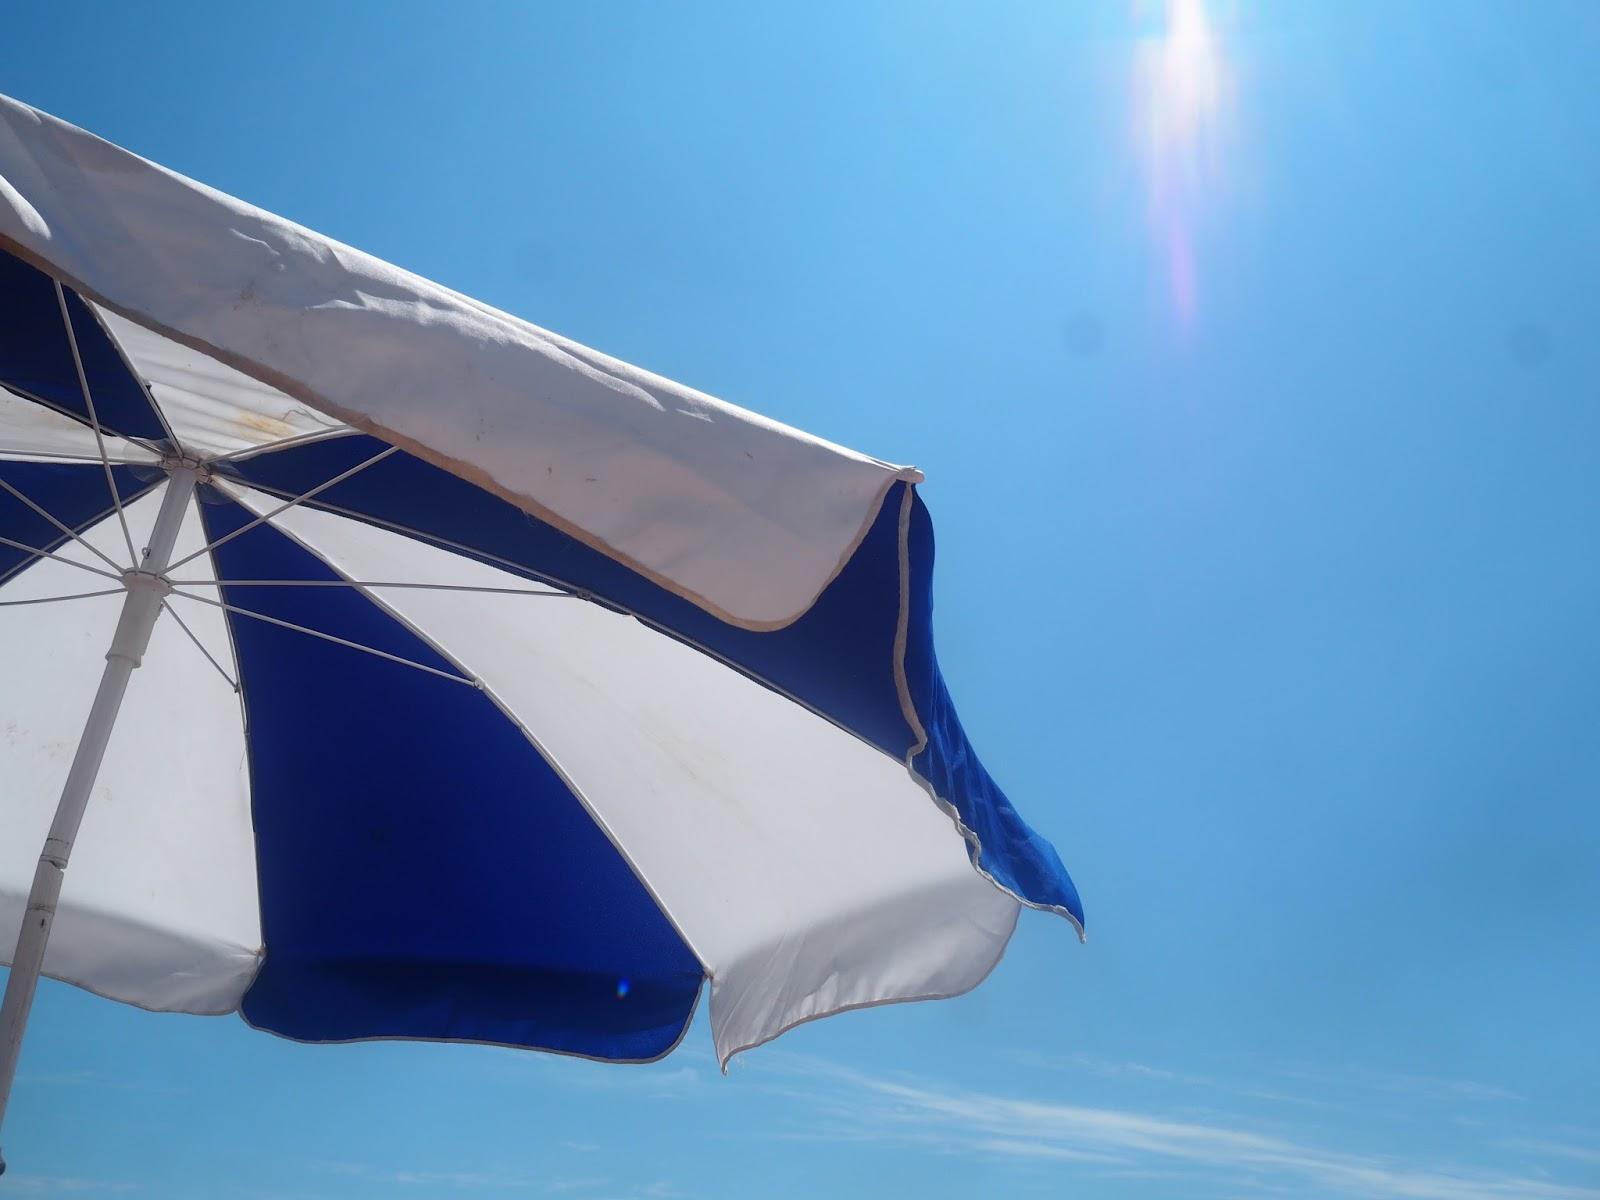 Parasol, Brighton beach